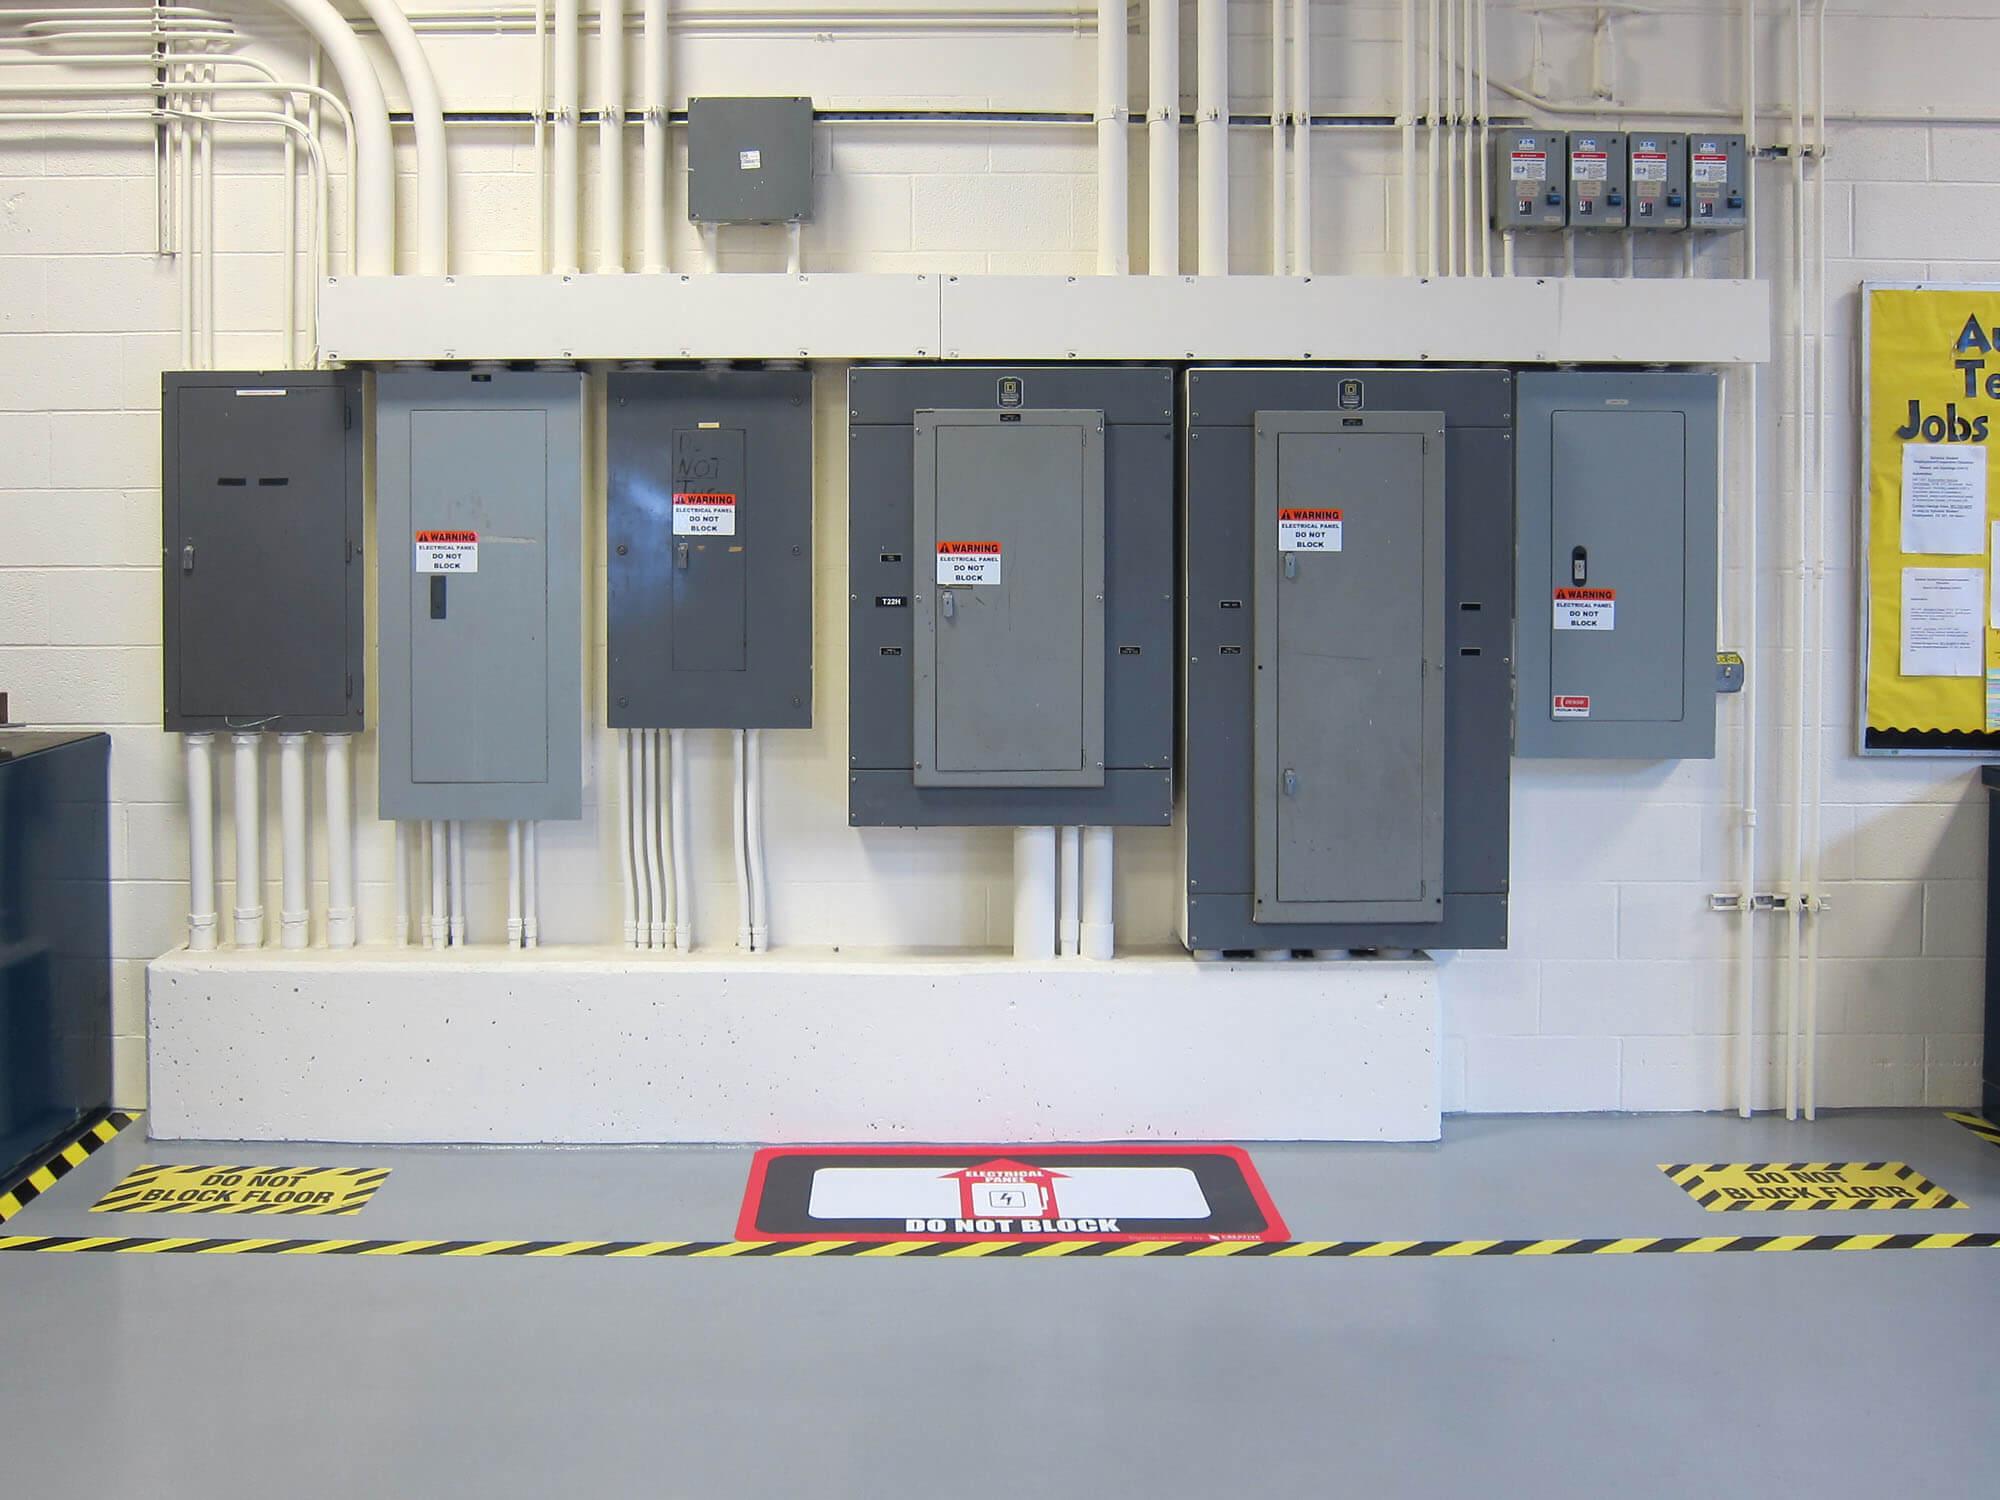 Safety Floor Markings